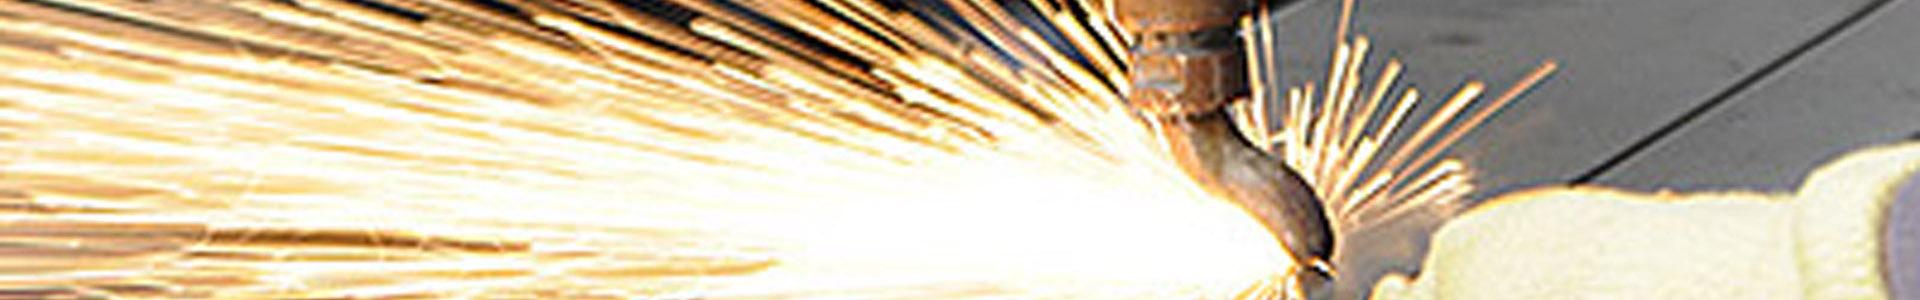 Zanetti Laser